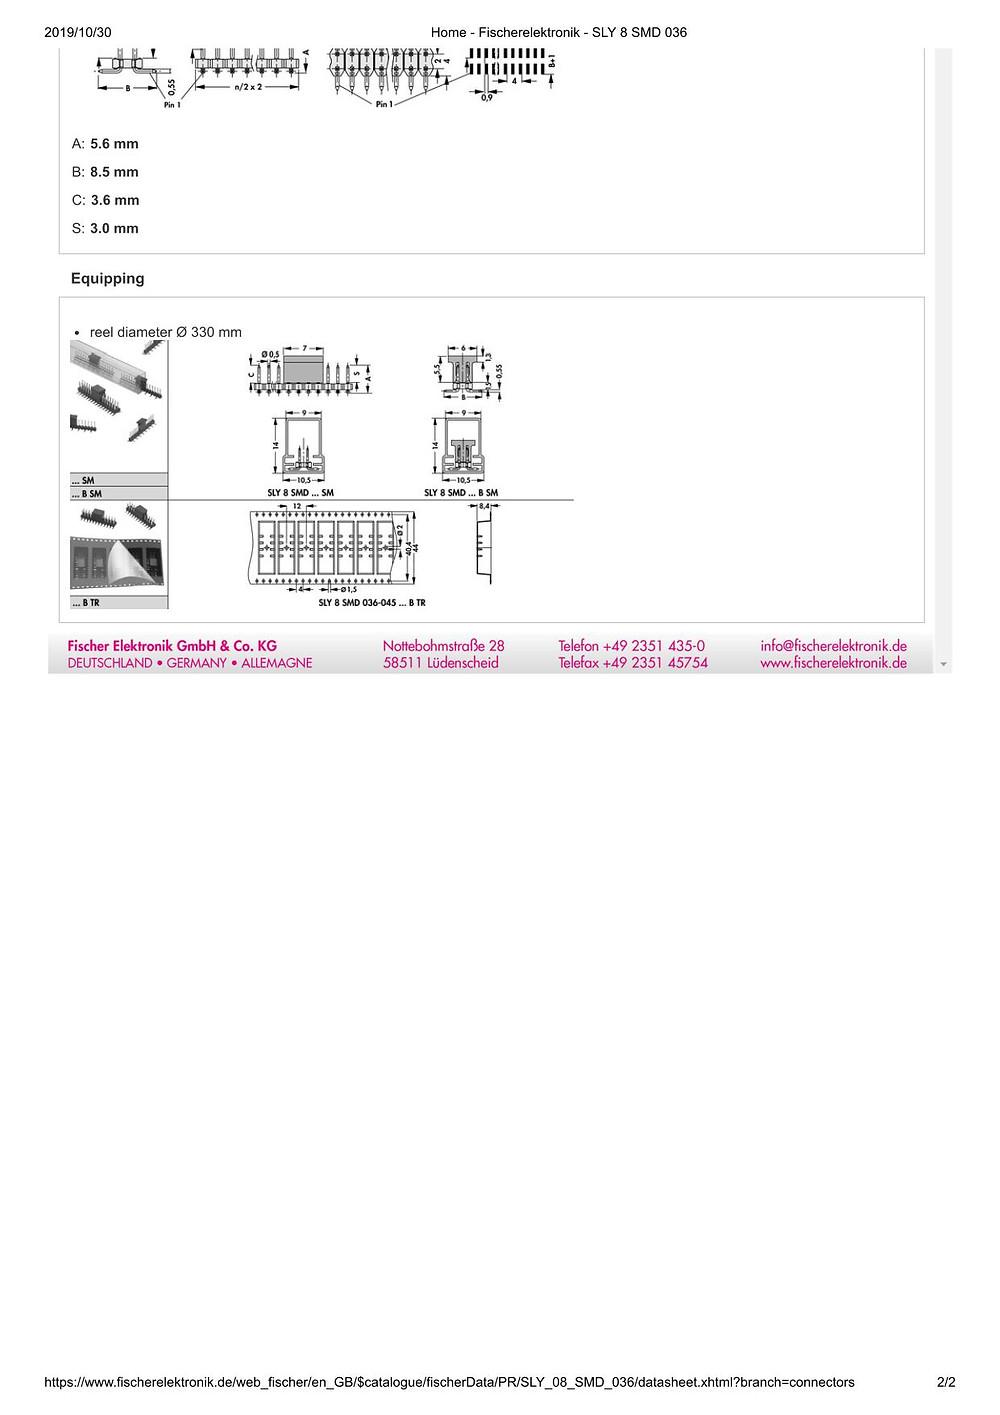 SLY 8 SMD 036 フィッシャー テープ&リール対応 ピンヘッダ 2列 2㎜ピッチ □0.5mm (1リール=650個巻)4-40ピン